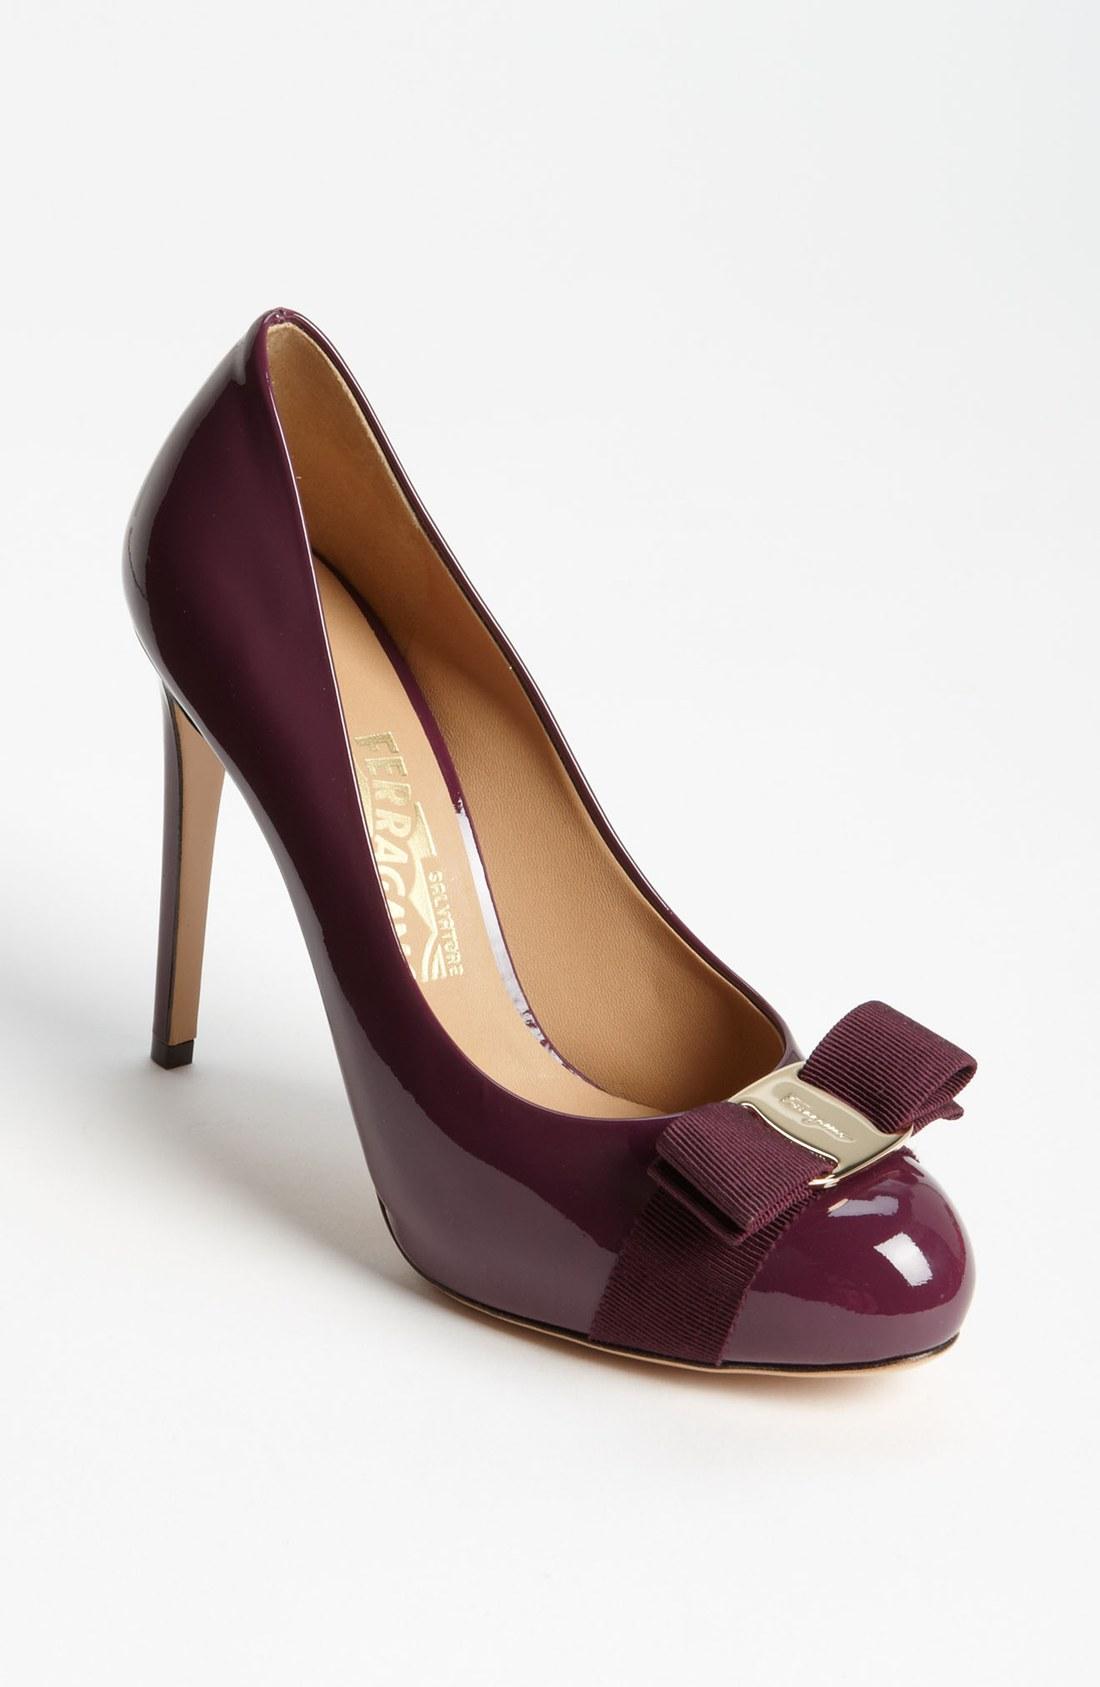 Kate Spade Shoes Sale